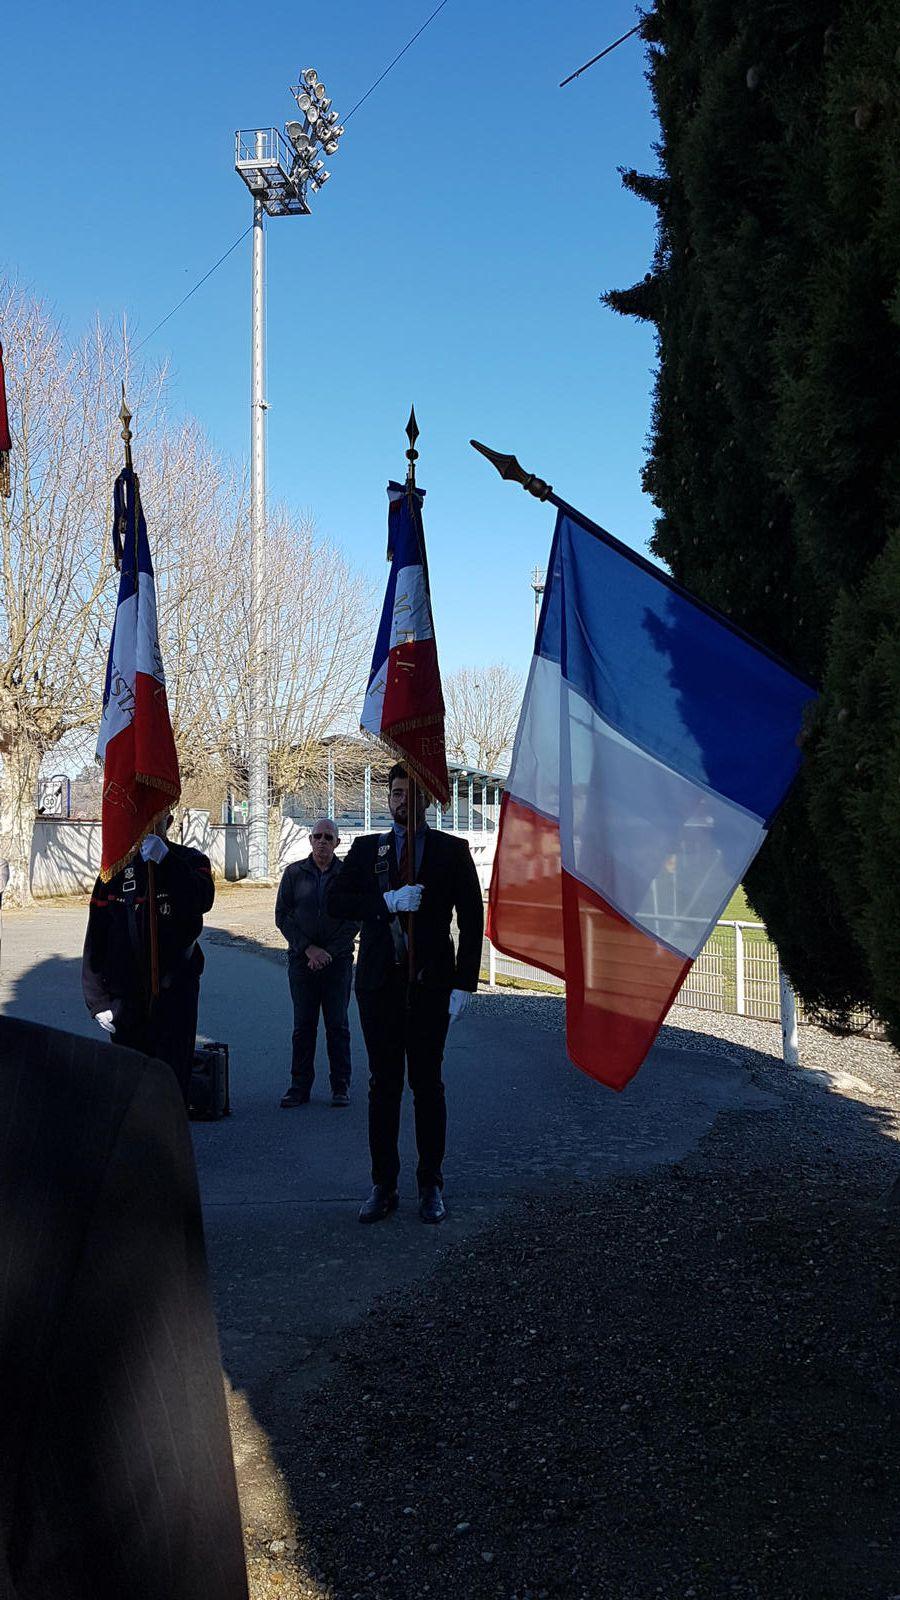 Photos de Zoé Gauthier - Jean-Pierre Blanc et Bernard Desjardins